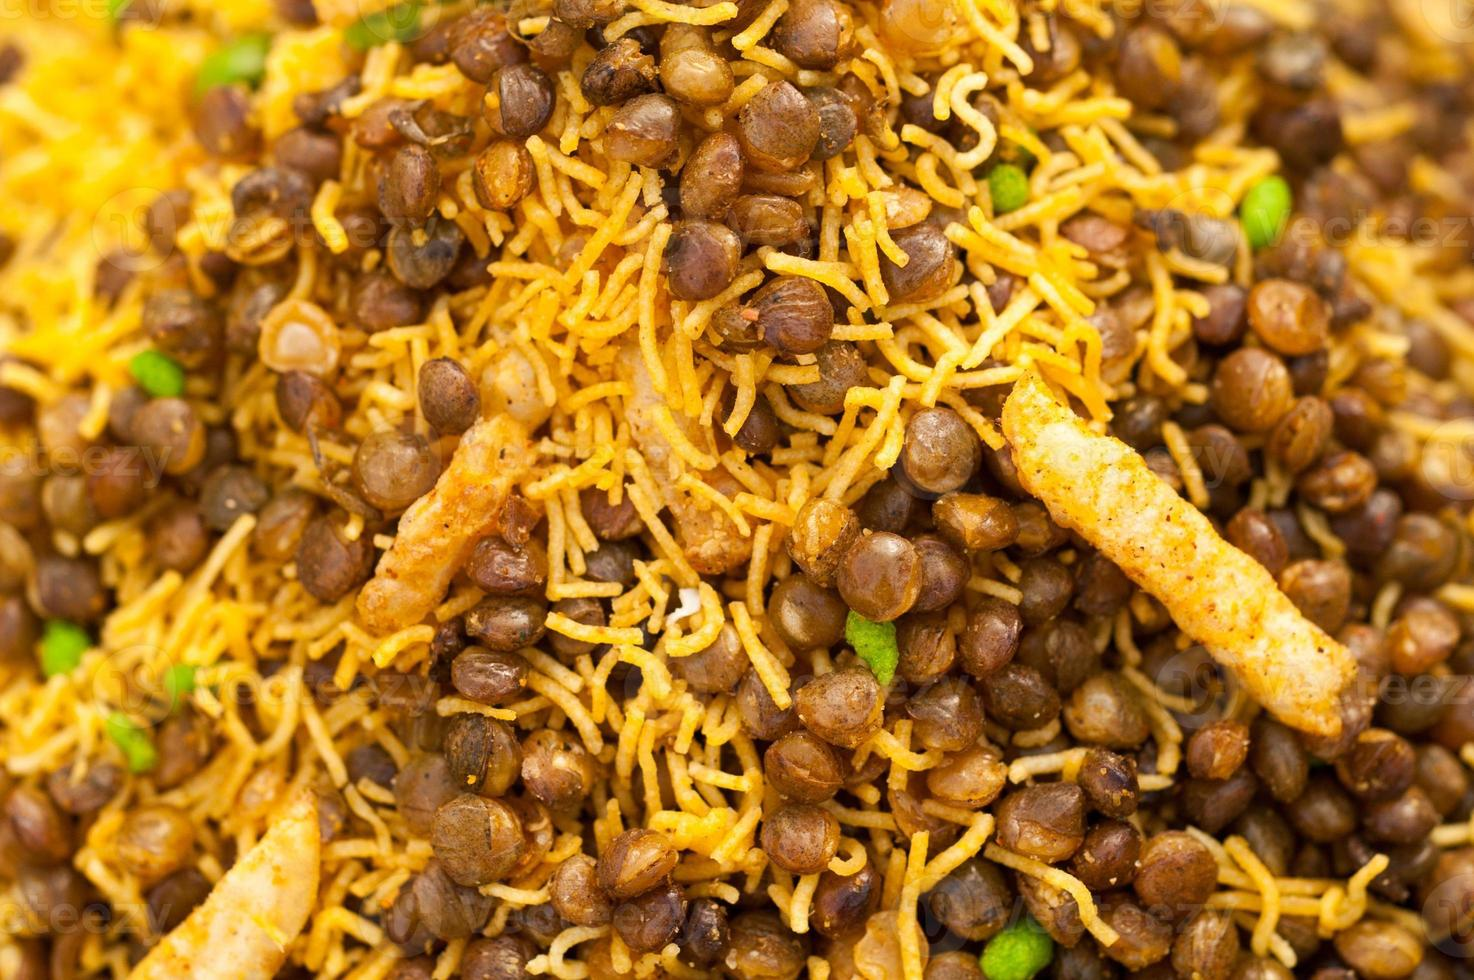 verschiedene getrocknete indische Getreide foto